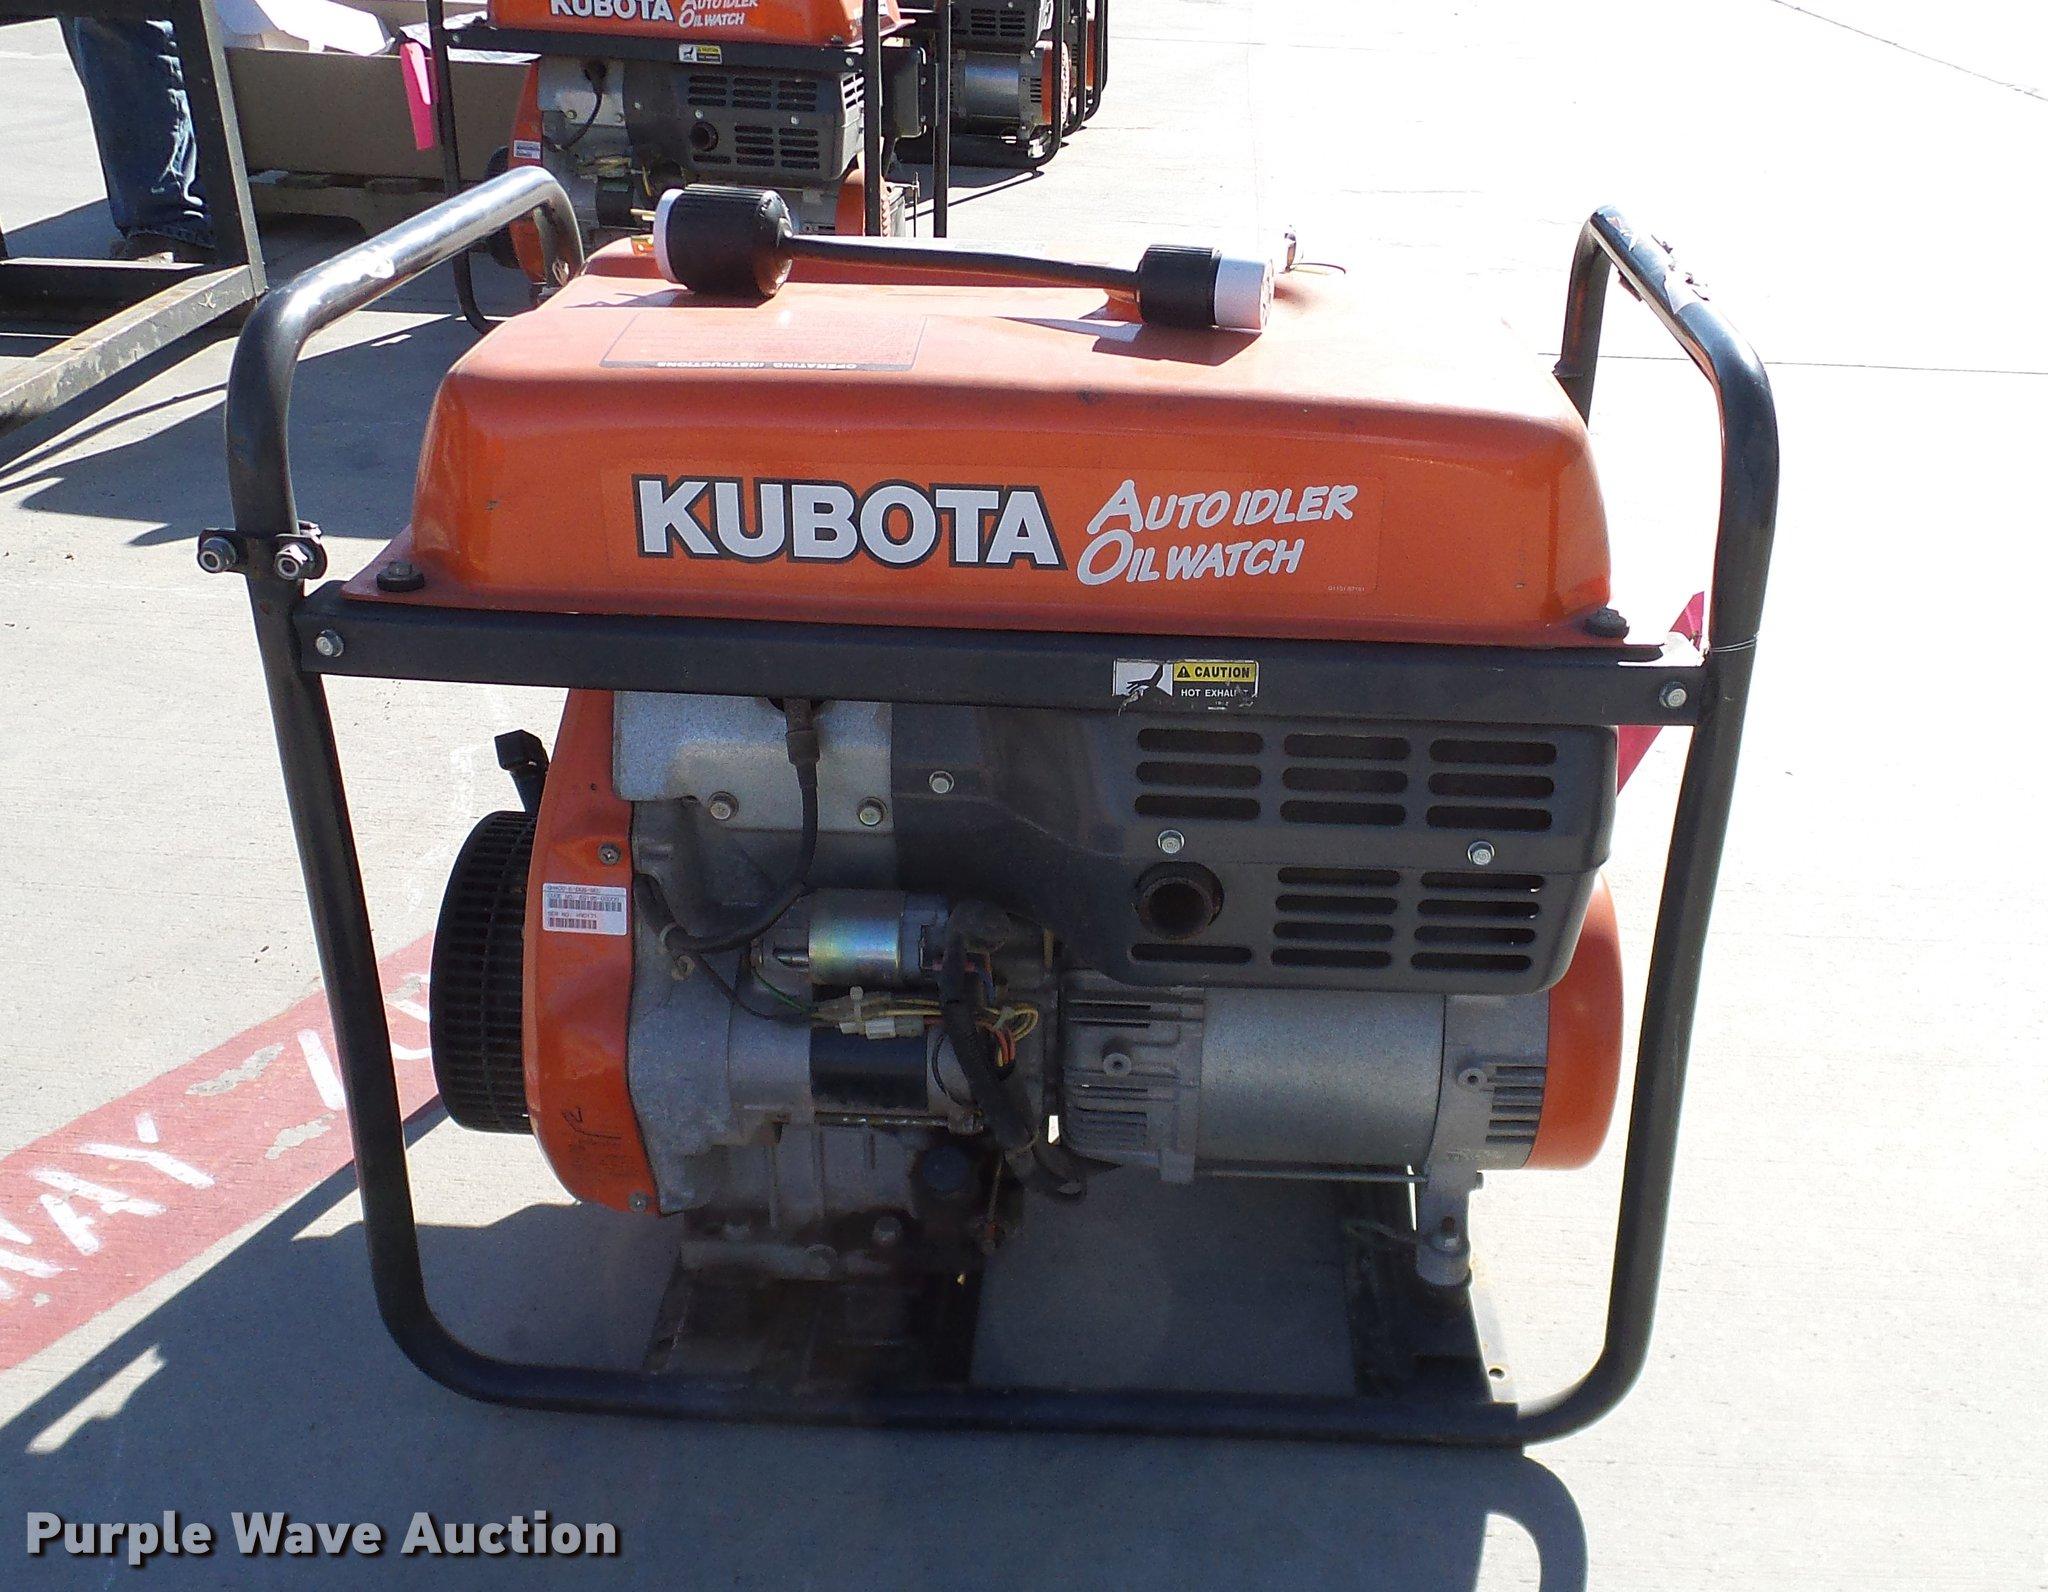 ... Kubota ARX6500 generator Full size in new window ...